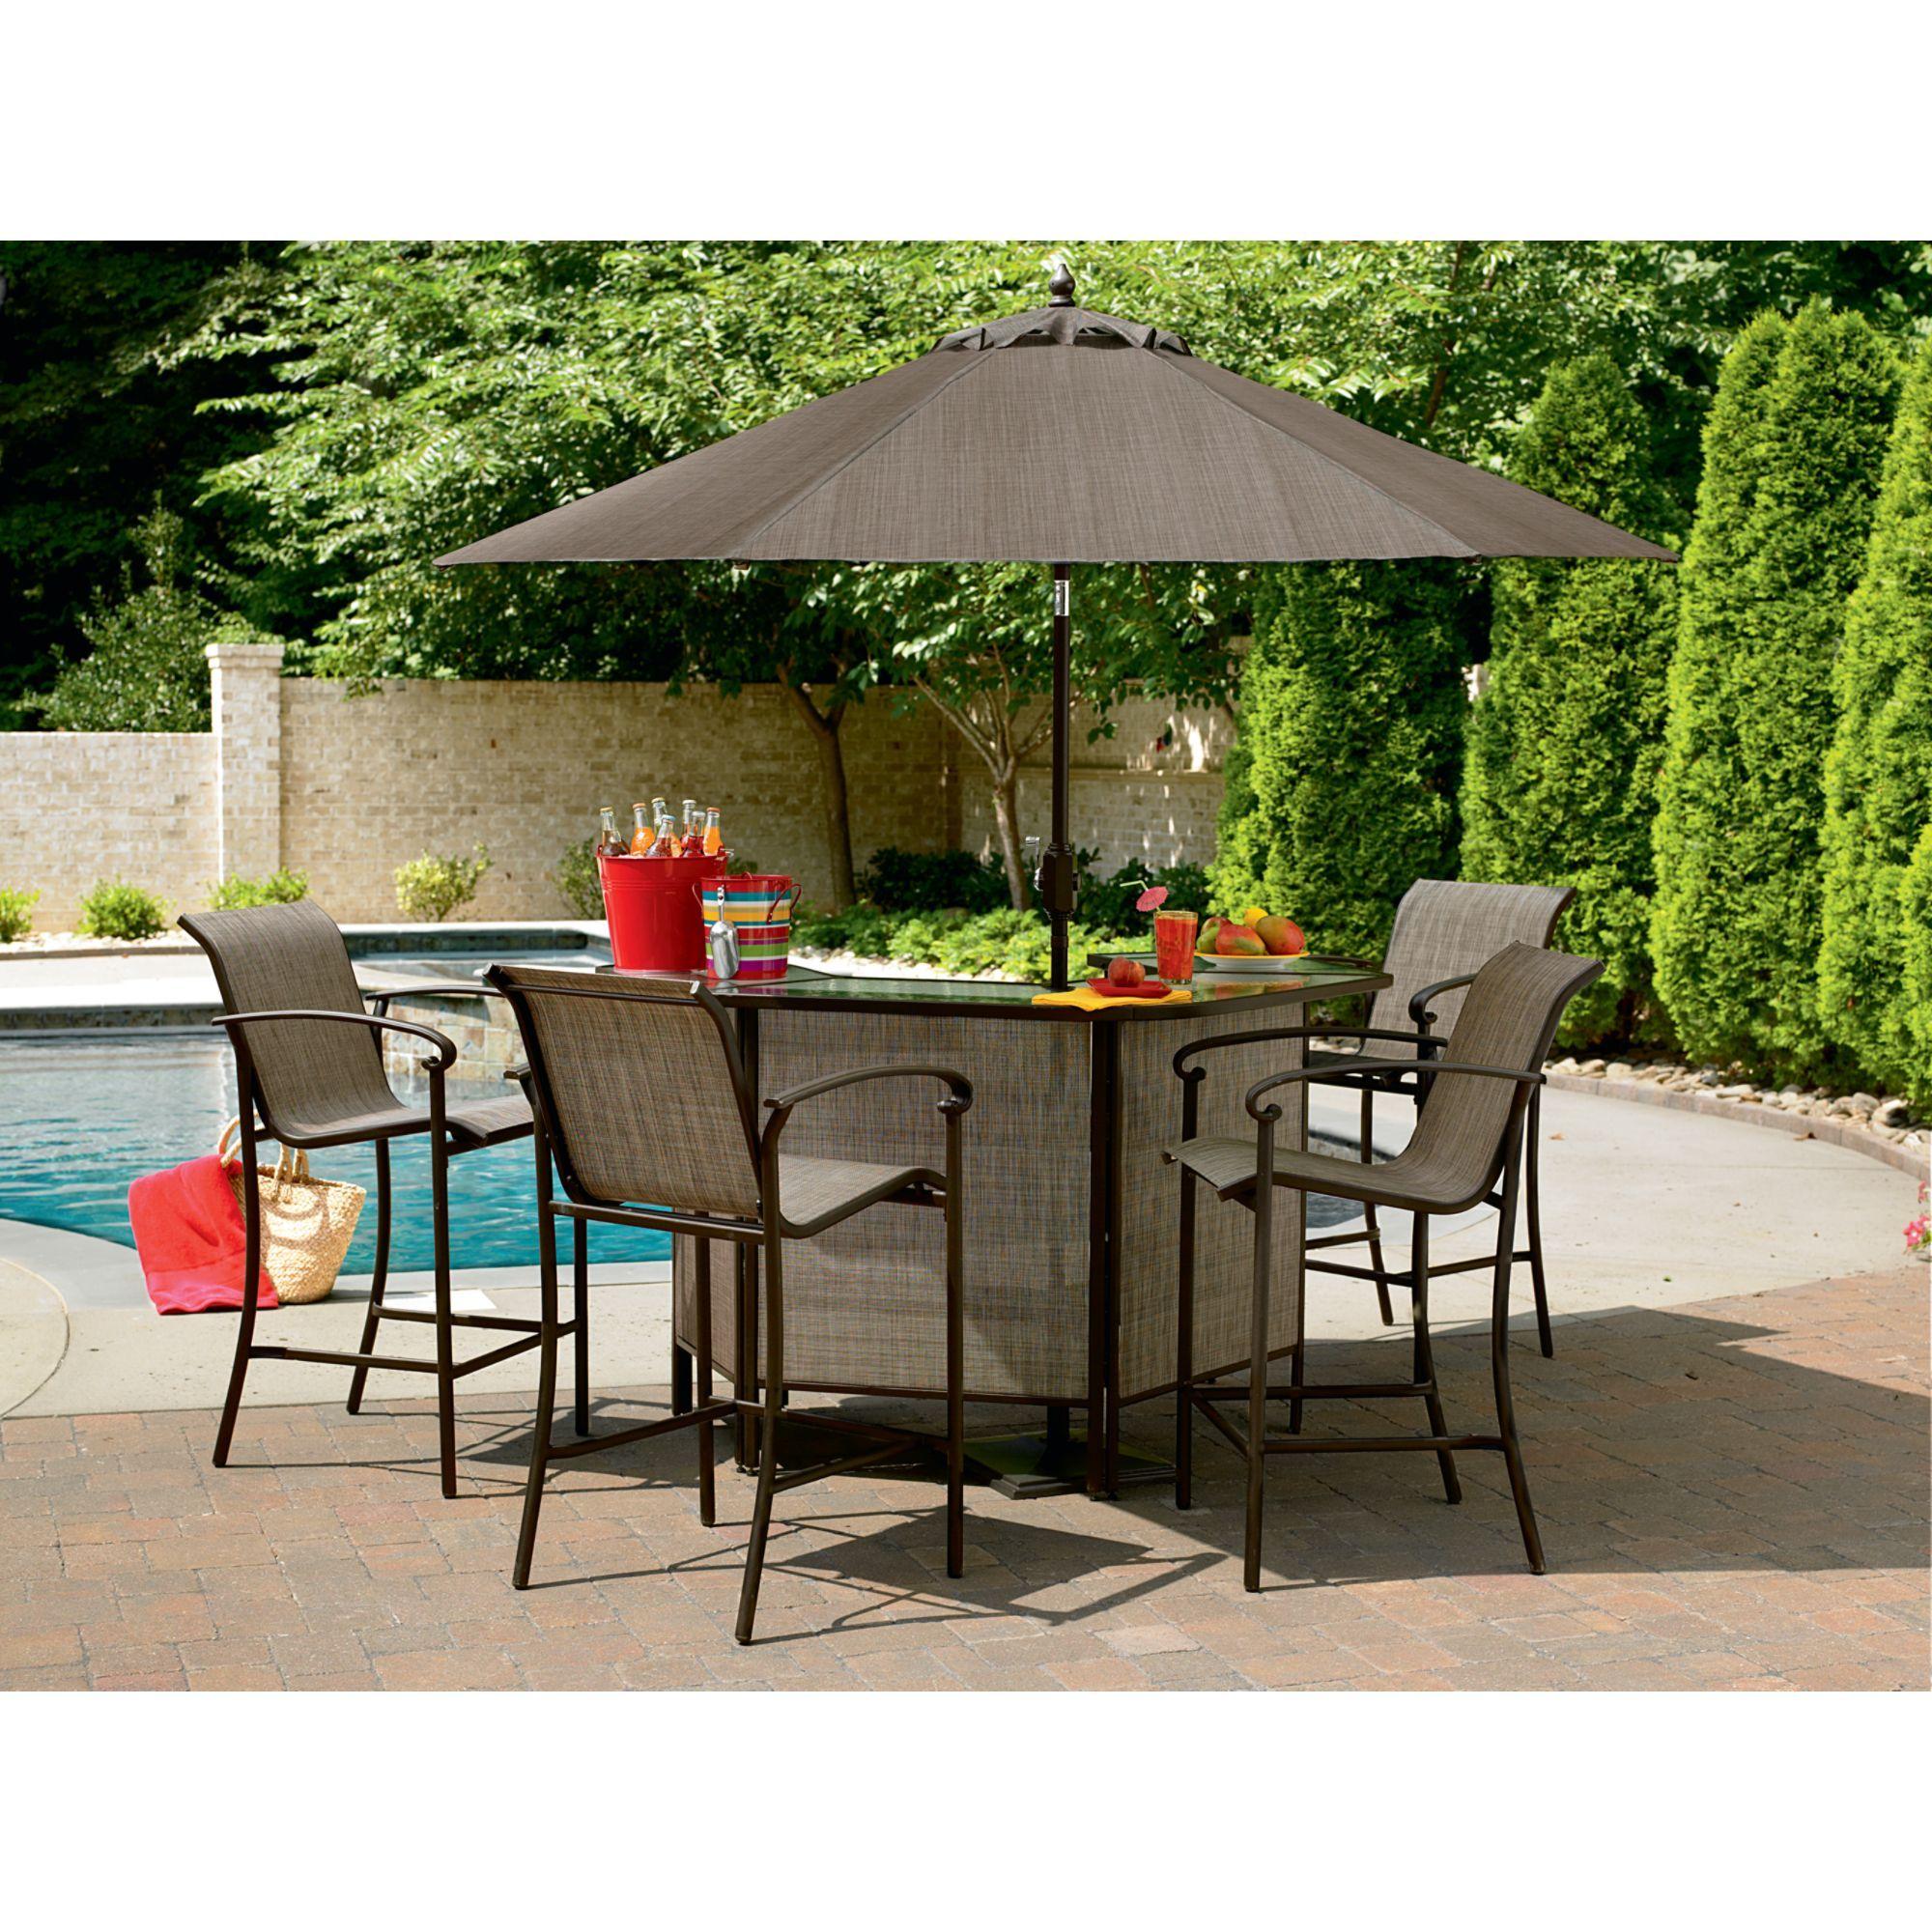 Kmart Outdoor Bar  Outdoor patio bar sets, Outdoor patio bar